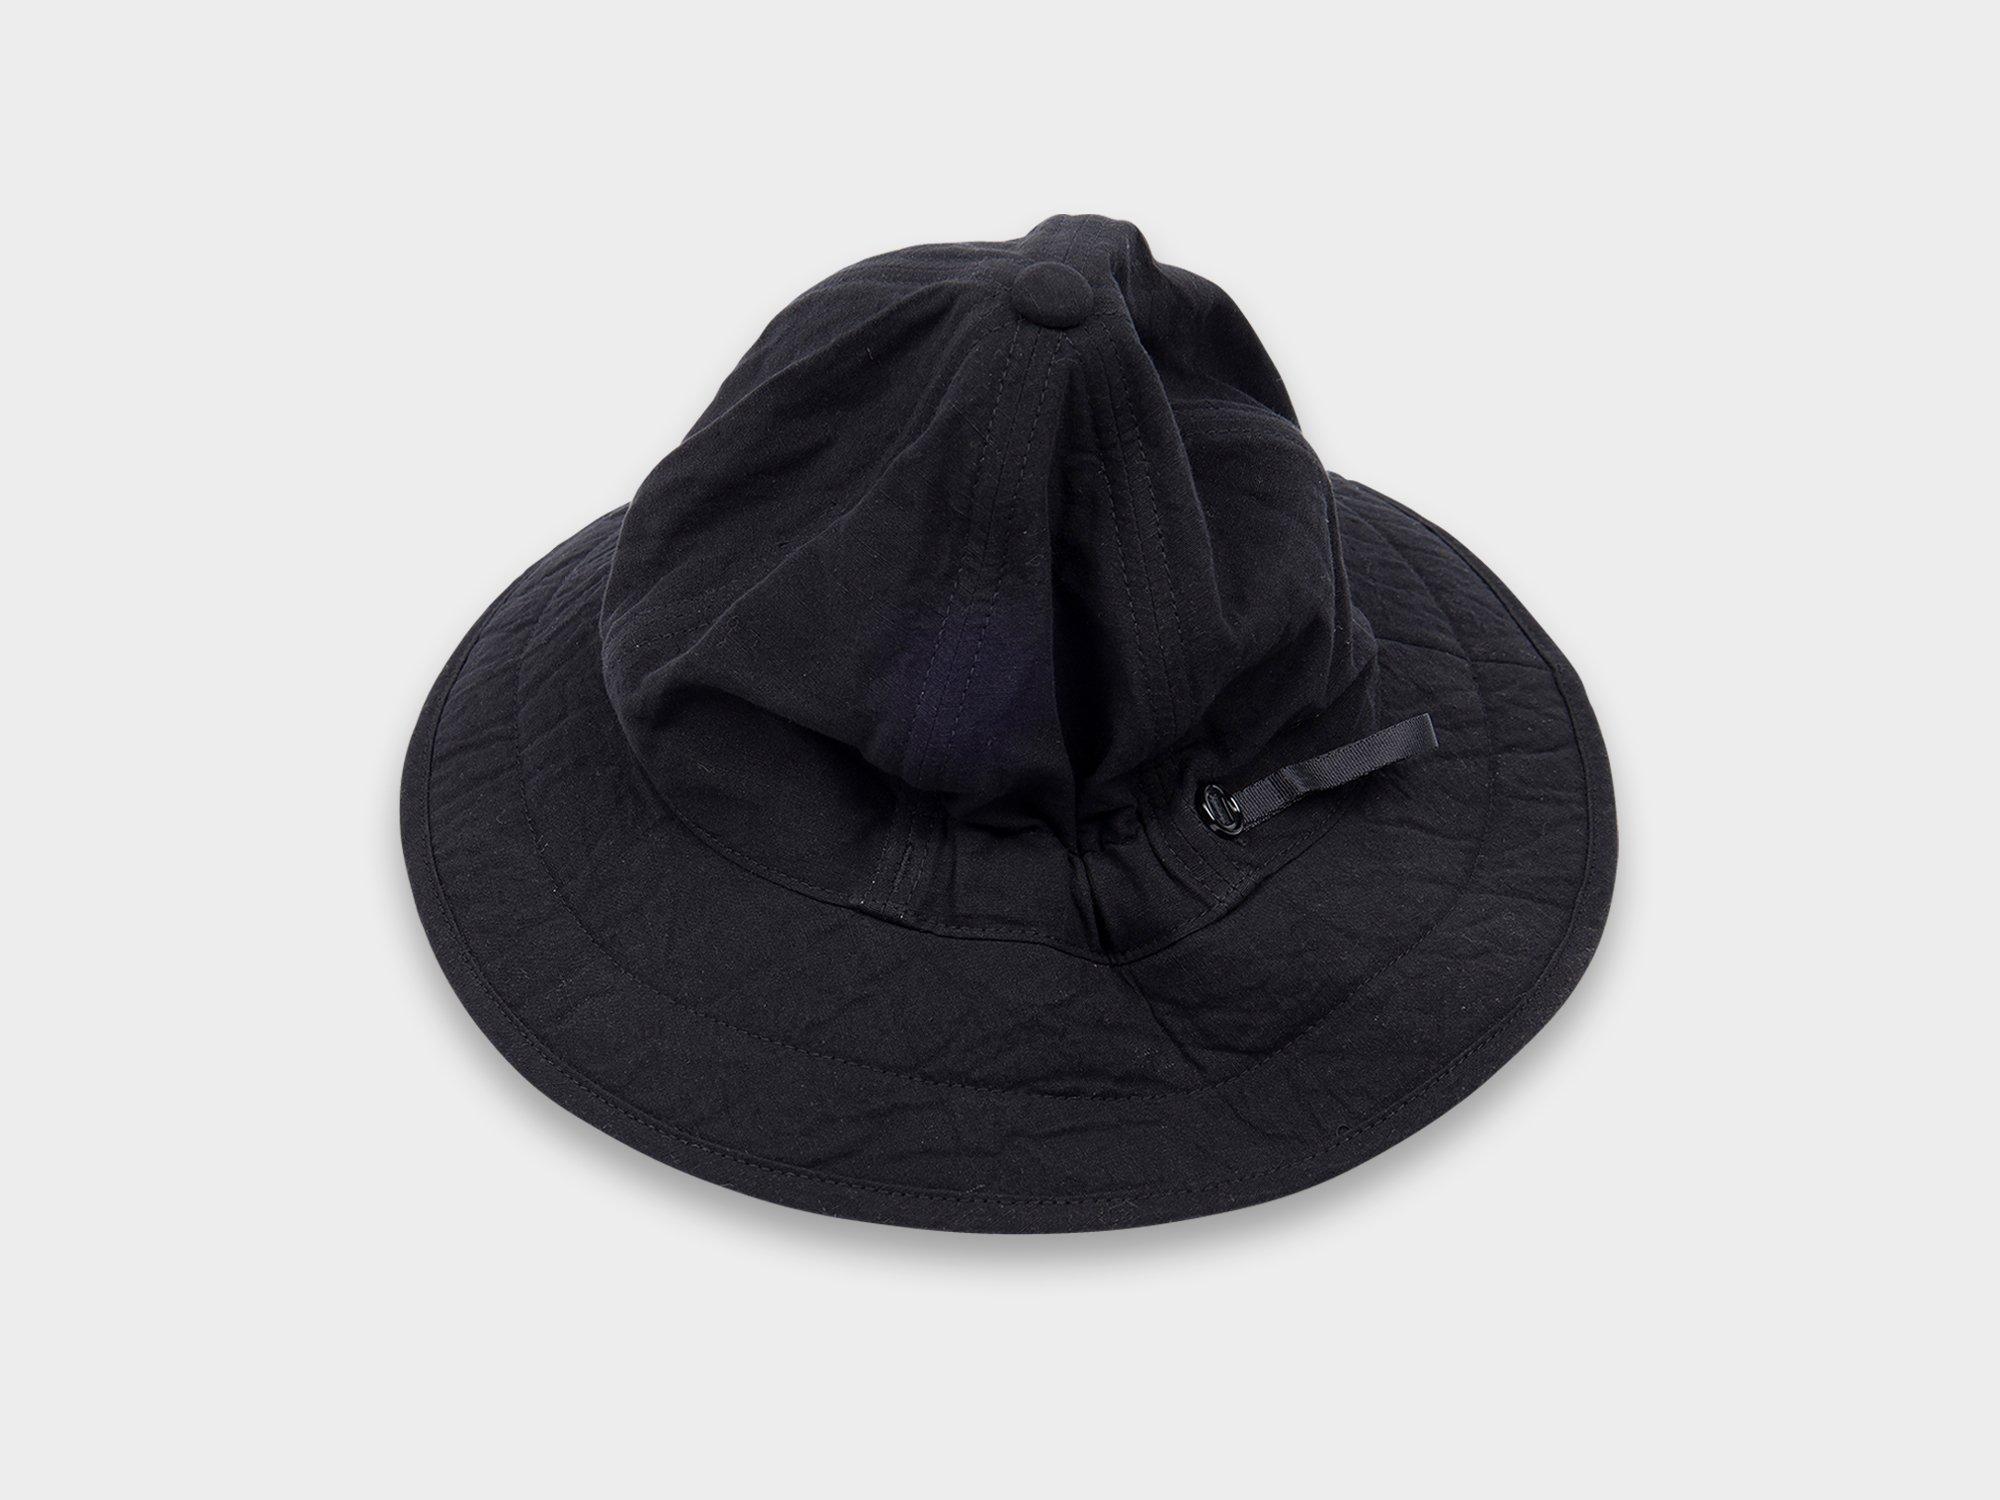 MAN-TLE 「 R10C2 - SIX PANEL HAT / SHADE BLACK 」